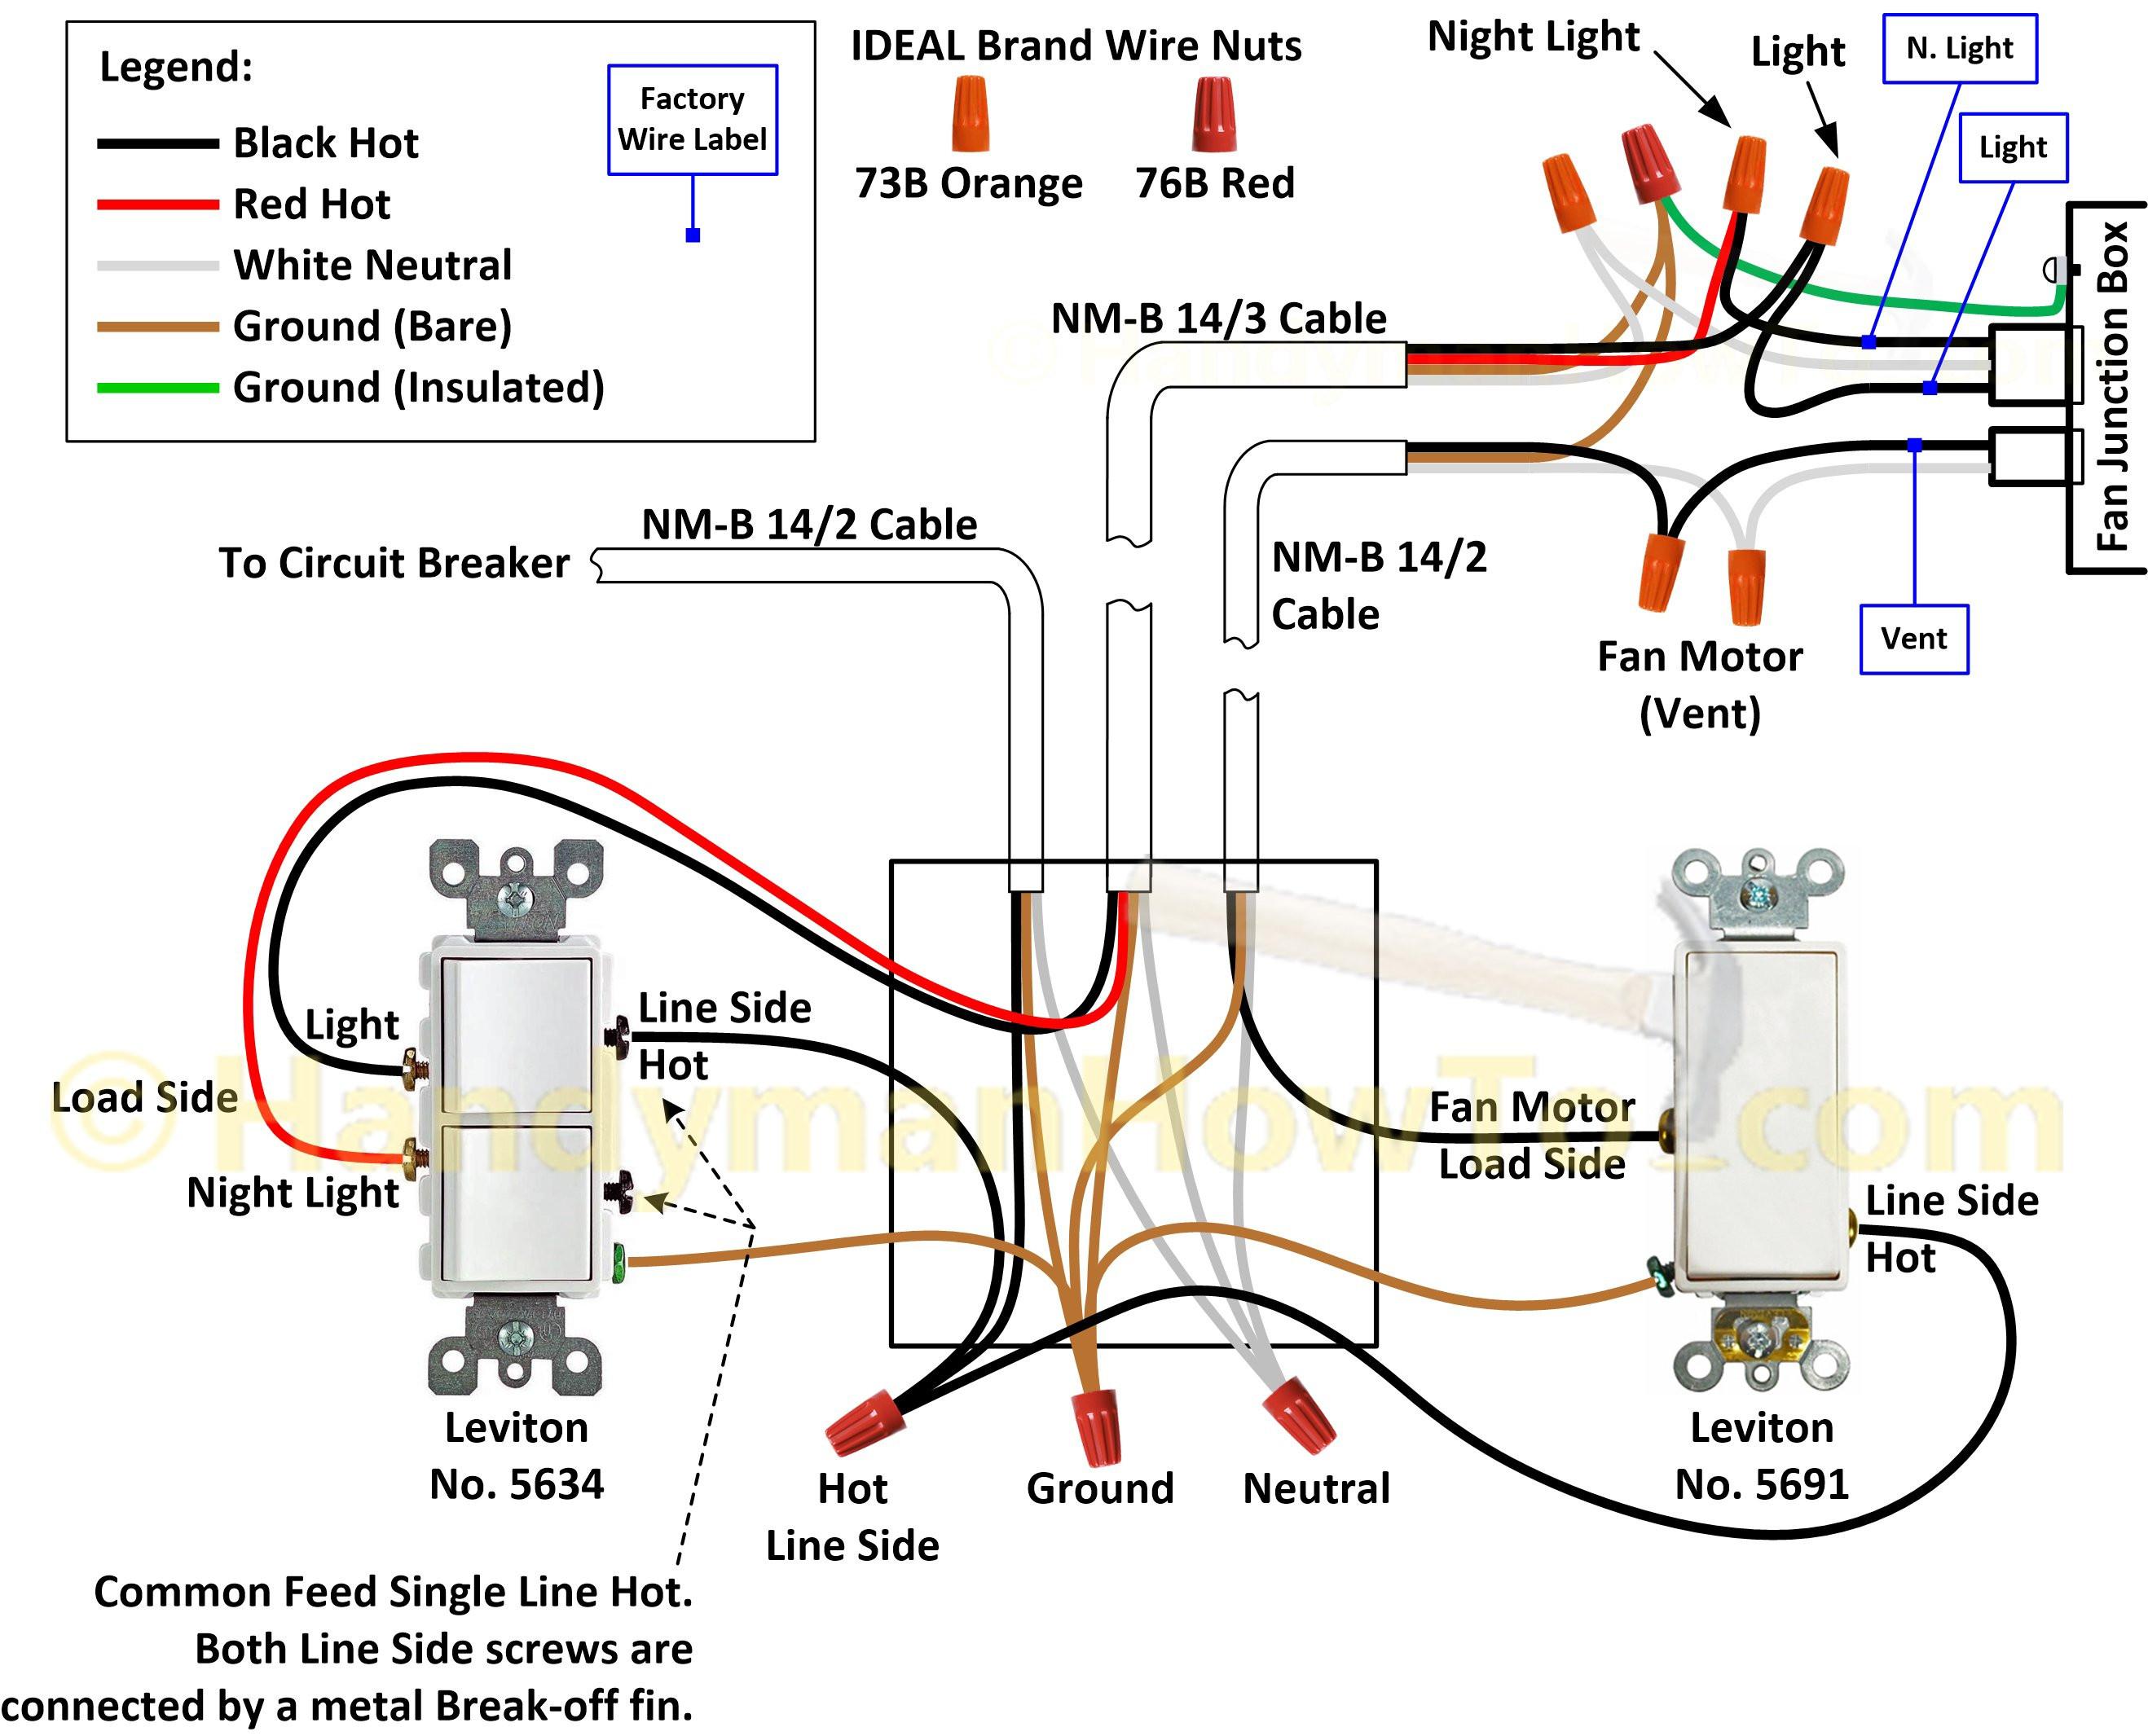 Kbic 120 Wiring Diagram Awesome Quantum Energy Generator User Manual - 277 Volt Wiring Diagram